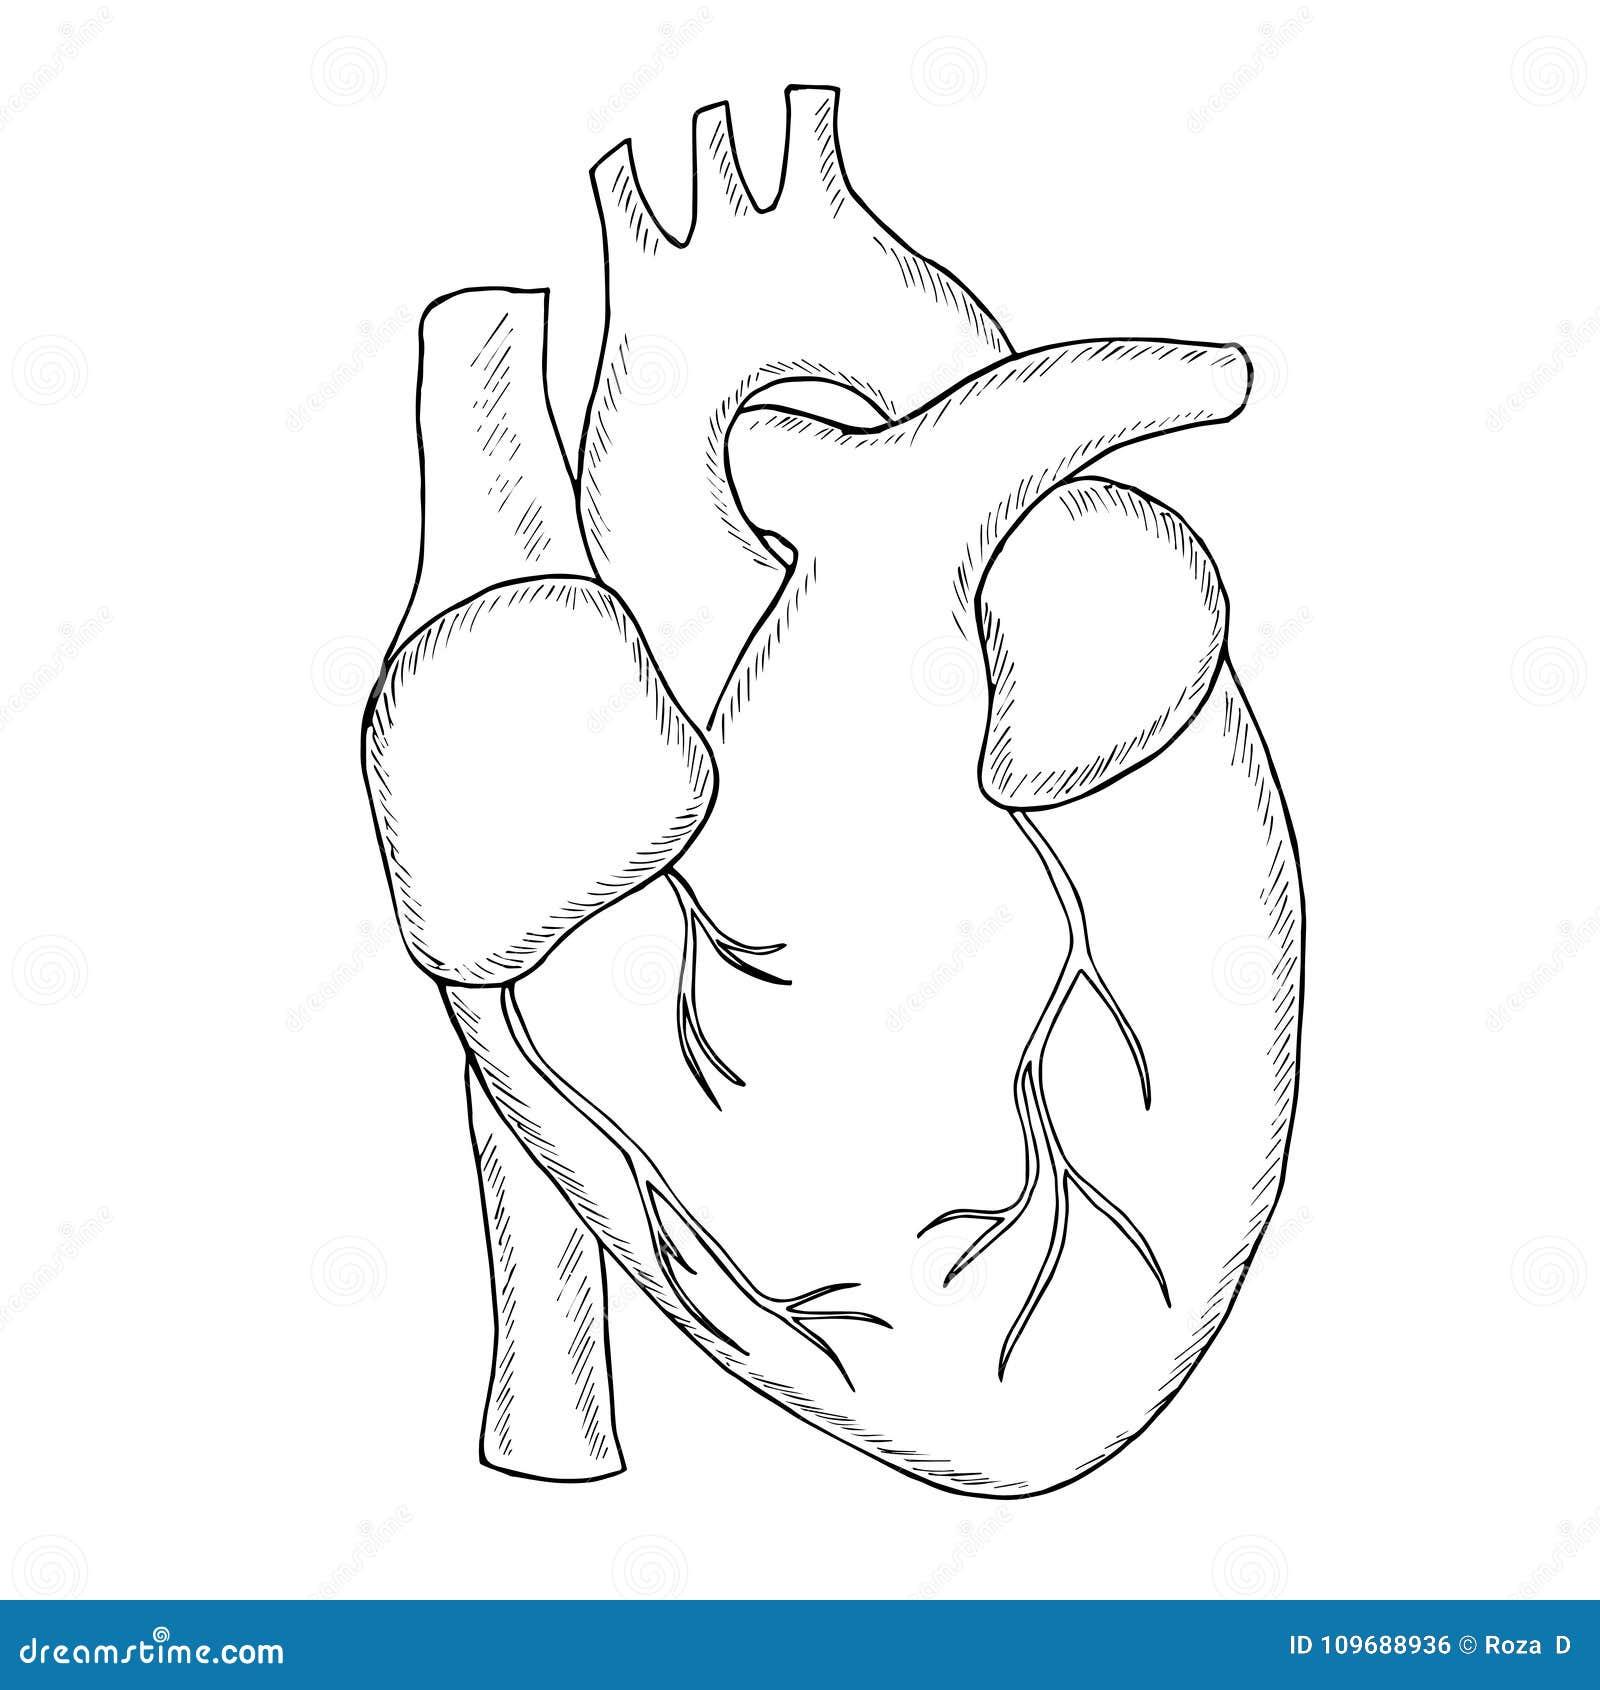 Human heart sketch liner stock vector. Illustration of ...